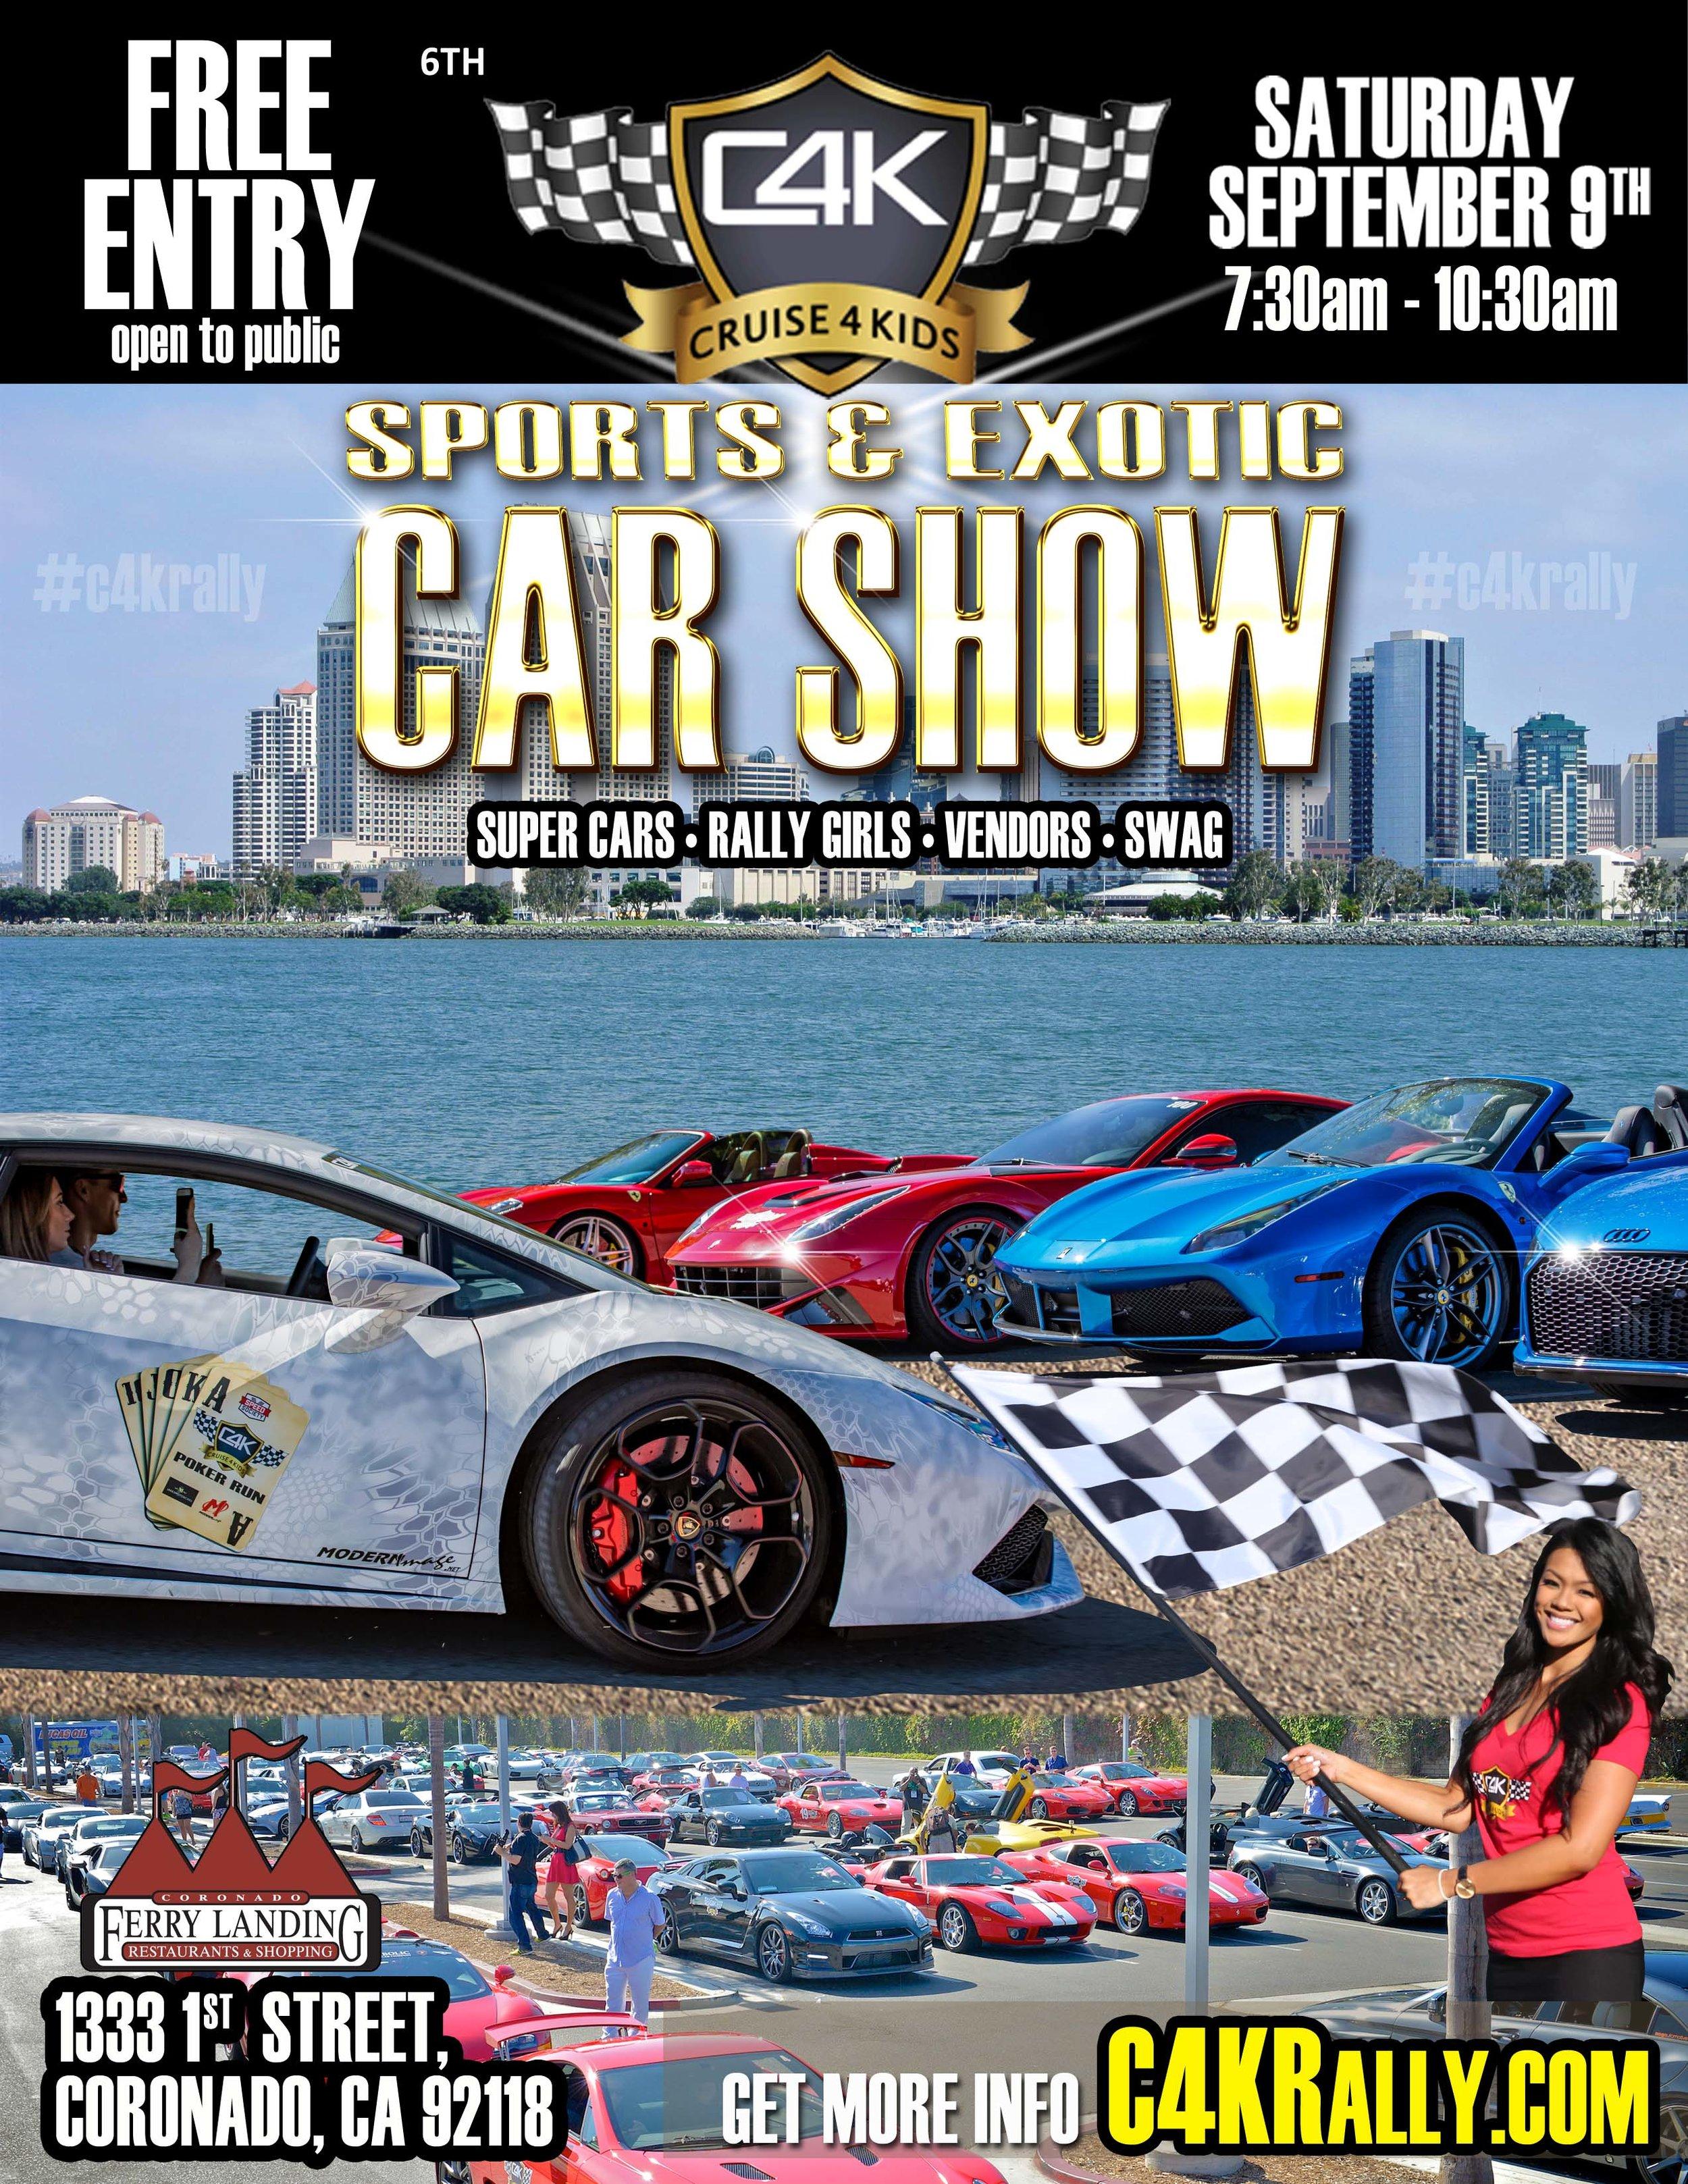 Car Show T Shirts For Sale - Car show t shirts for sale